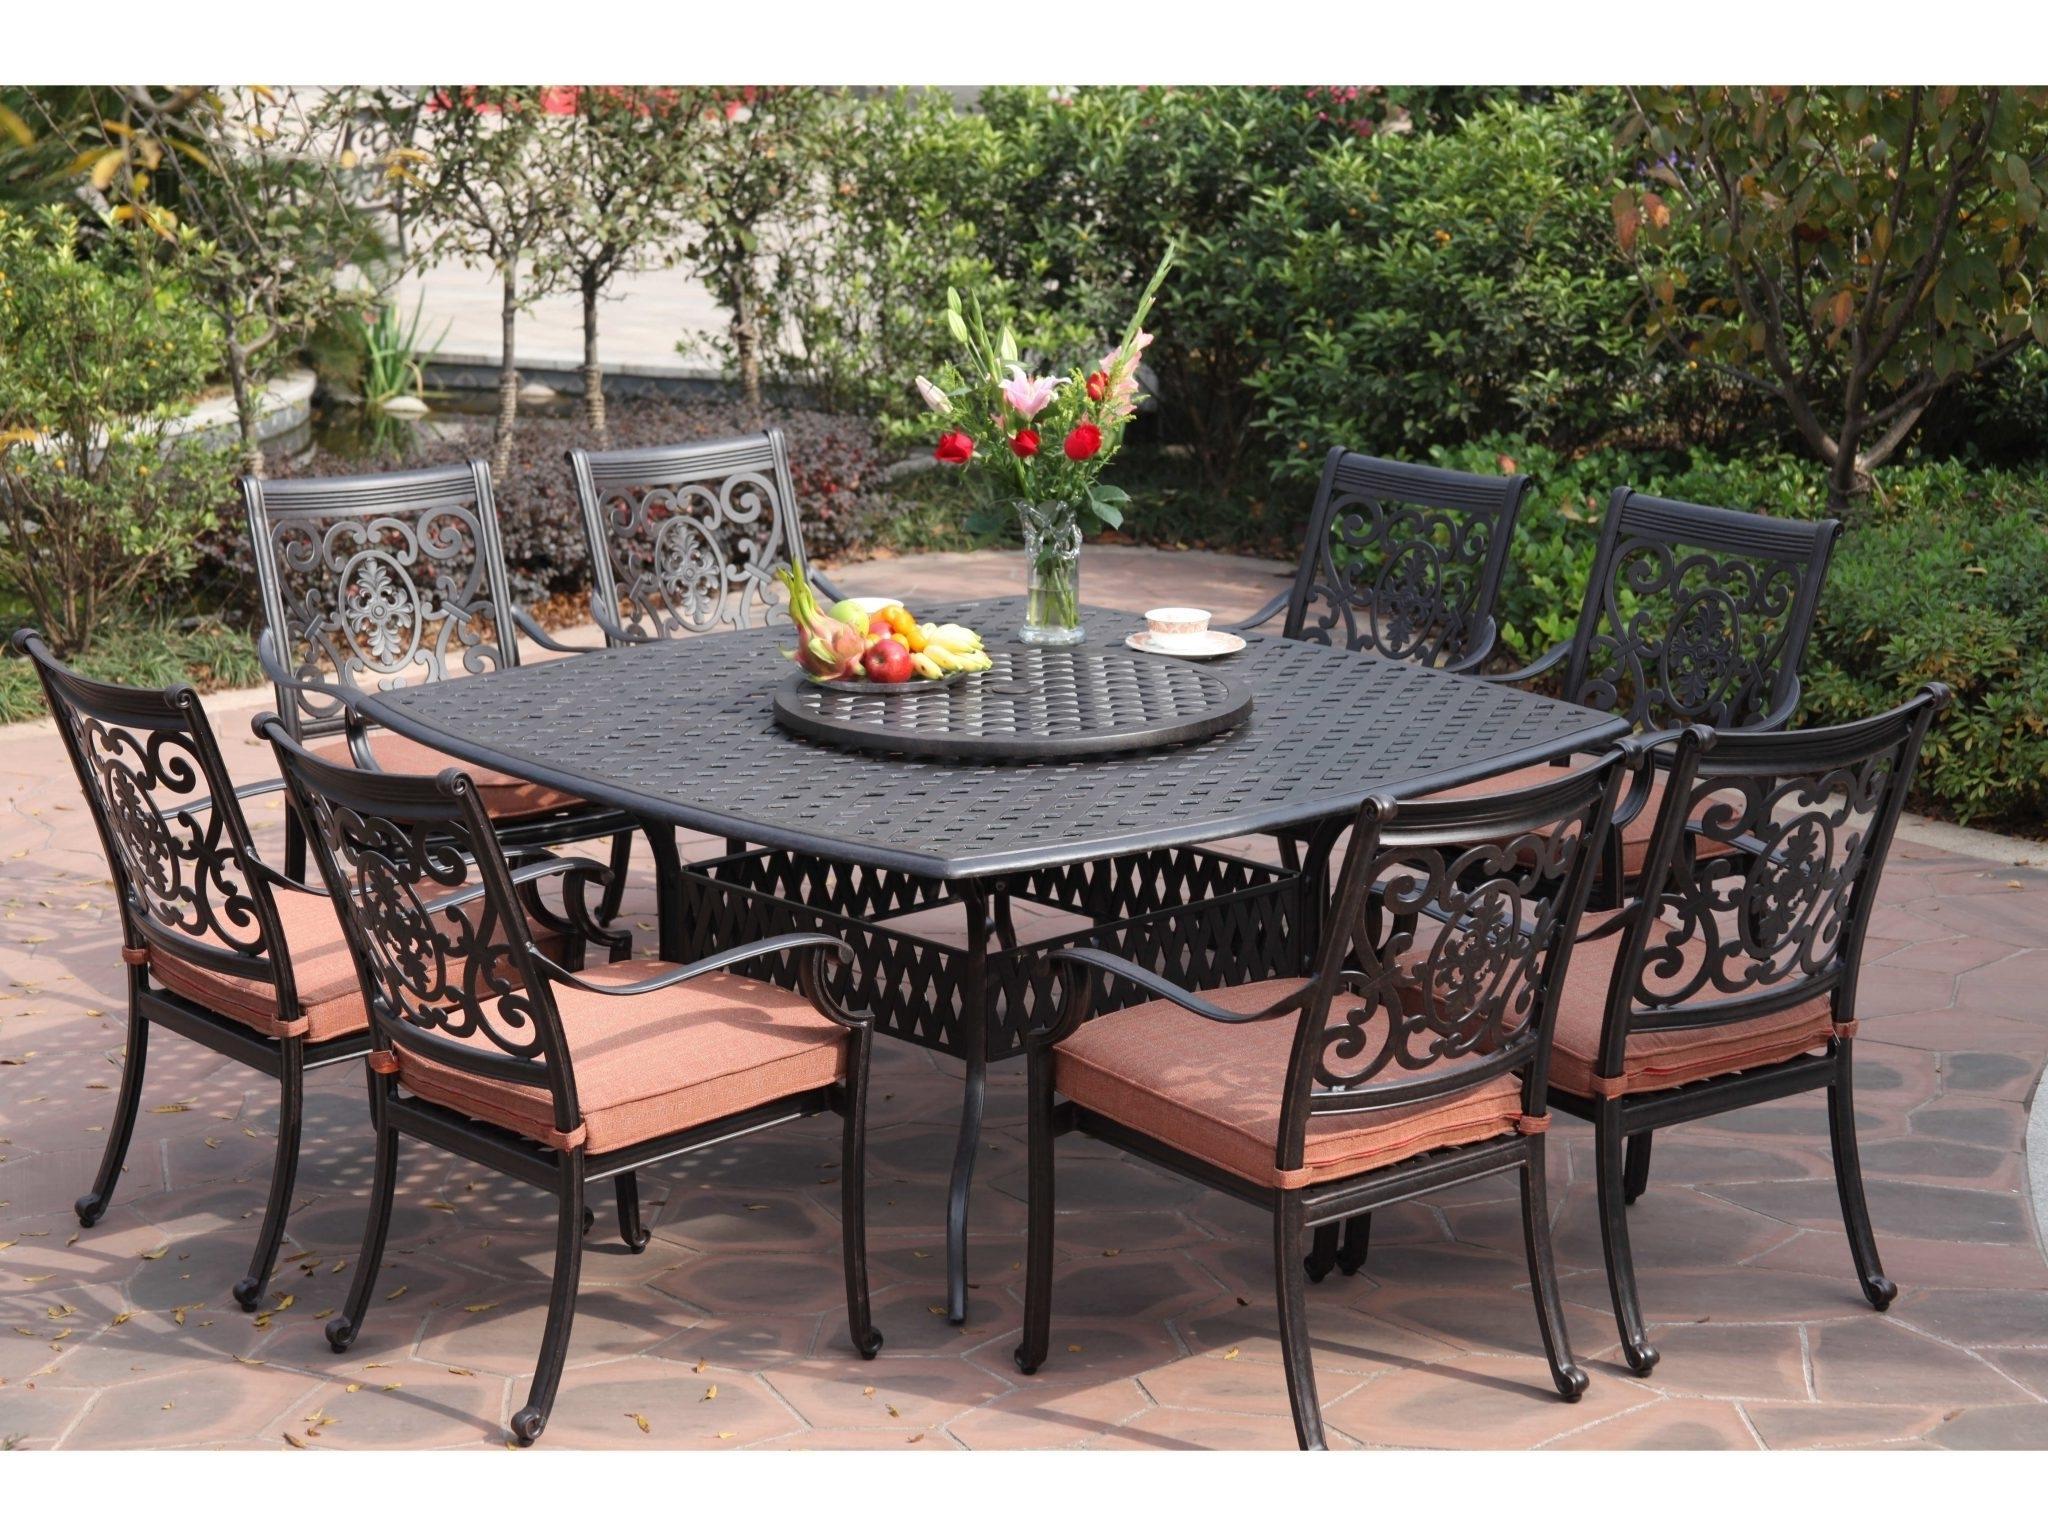 Most Recent Attractive Patio Furniture Costco Online 22 Wonderful Chairs Up Regarding Kirkland Patio Umbrellas (View 9 of 20)